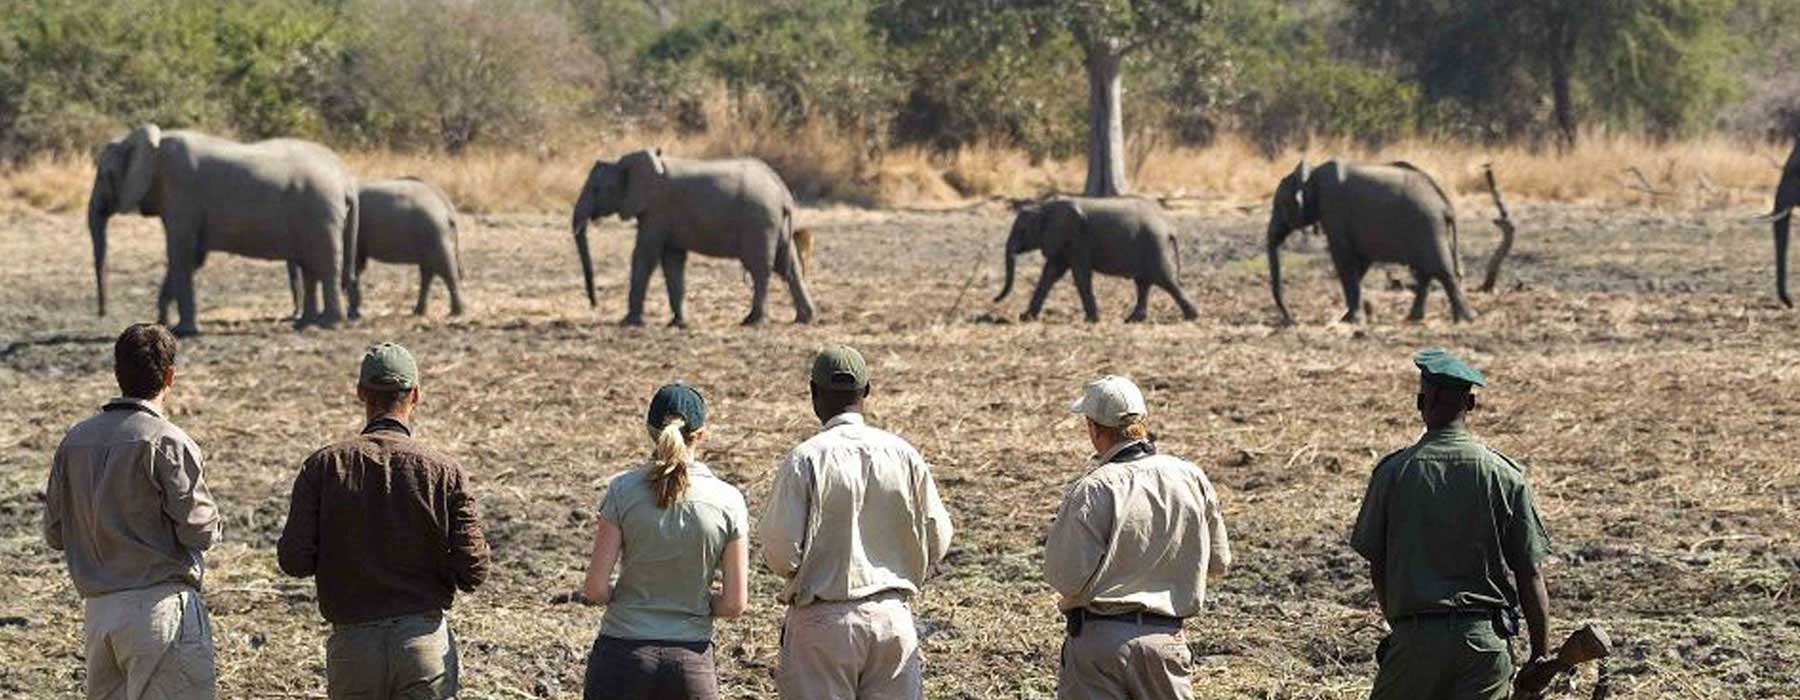 Professional Safari Guides